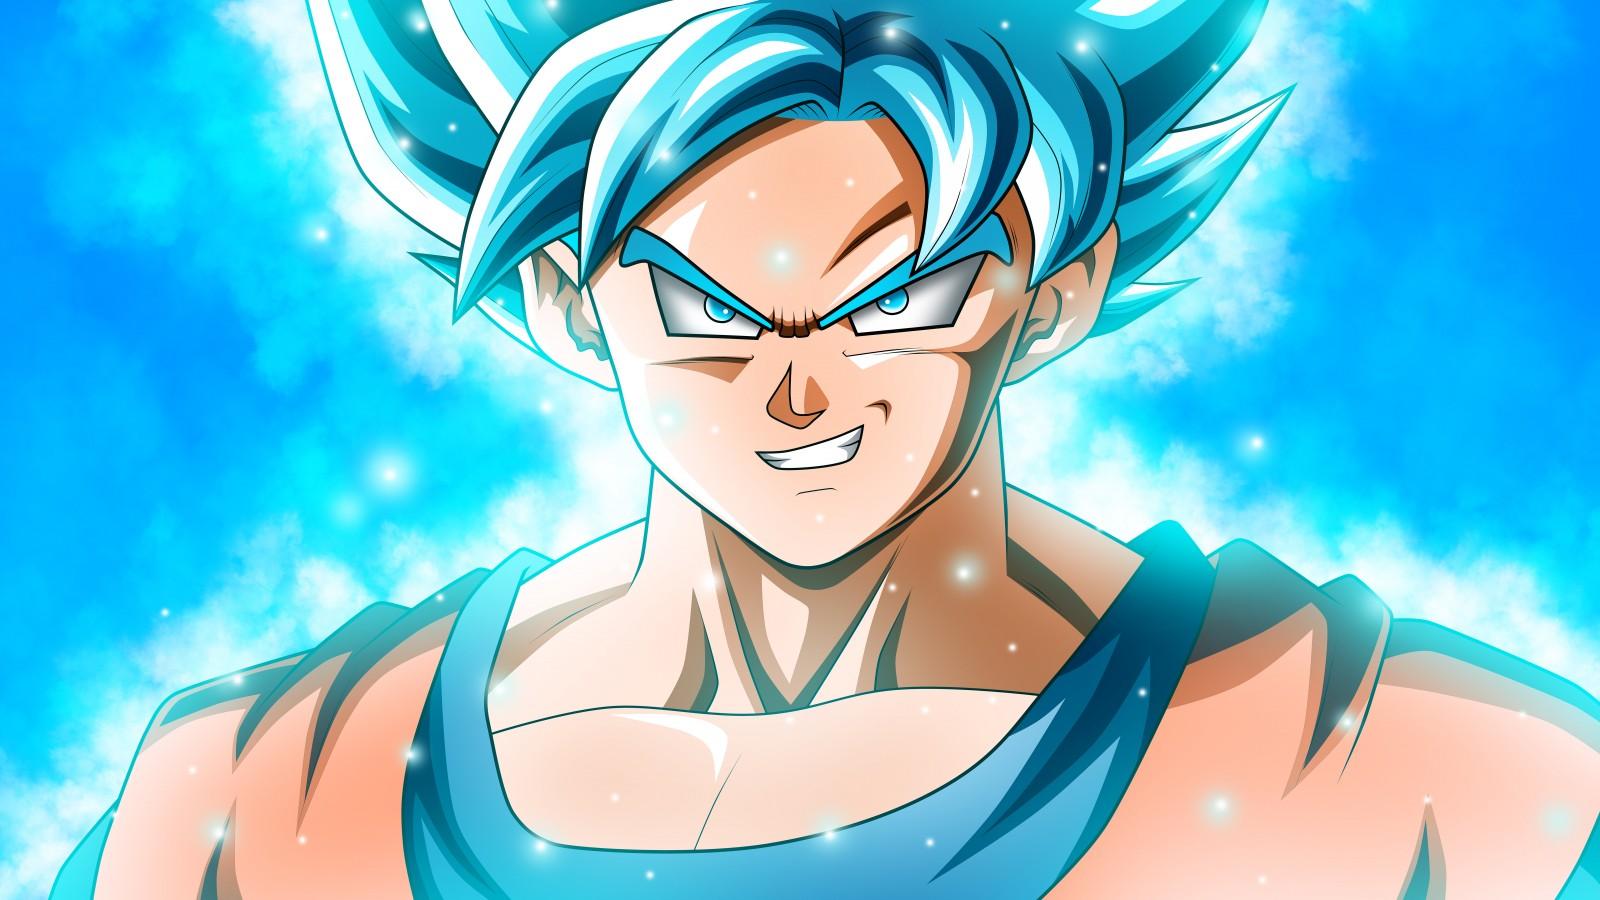 Popular Wallpapers For Iphone 5 Goku Dragon Ball Super 4k 8k Wallpapers Hd Wallpapers